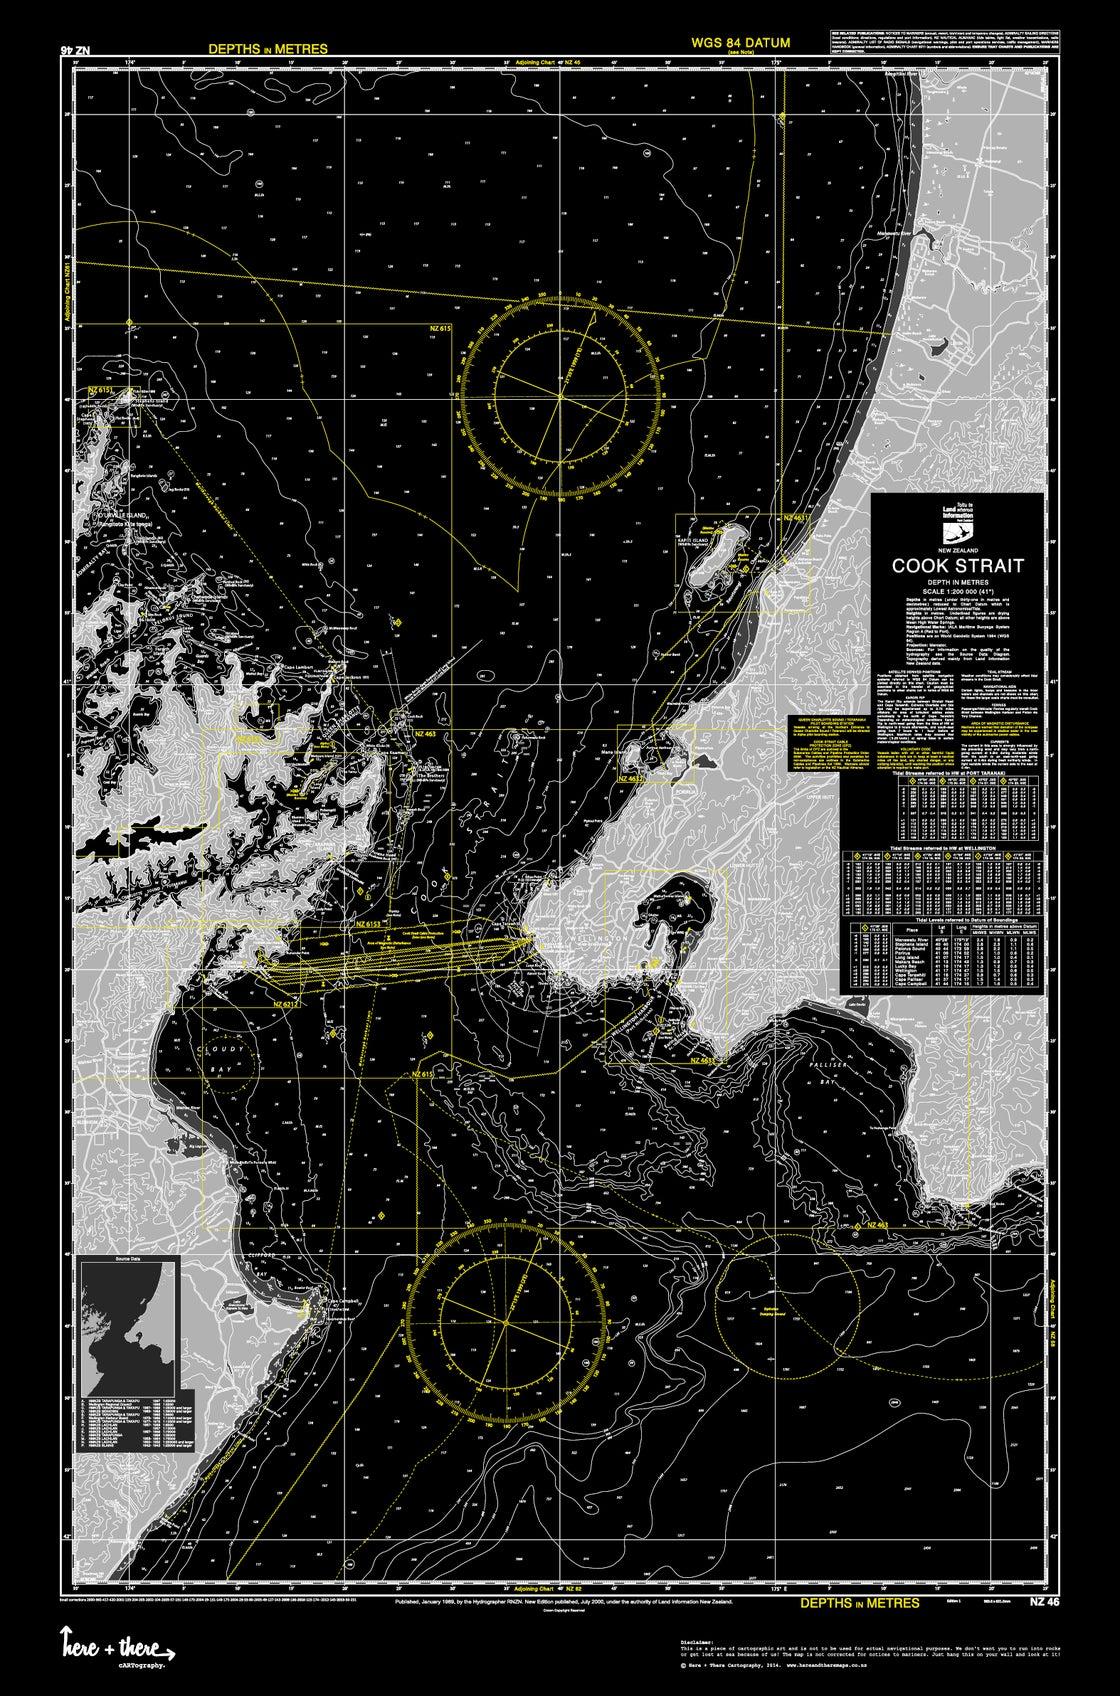 Image of Cook Strait - Black Mamba